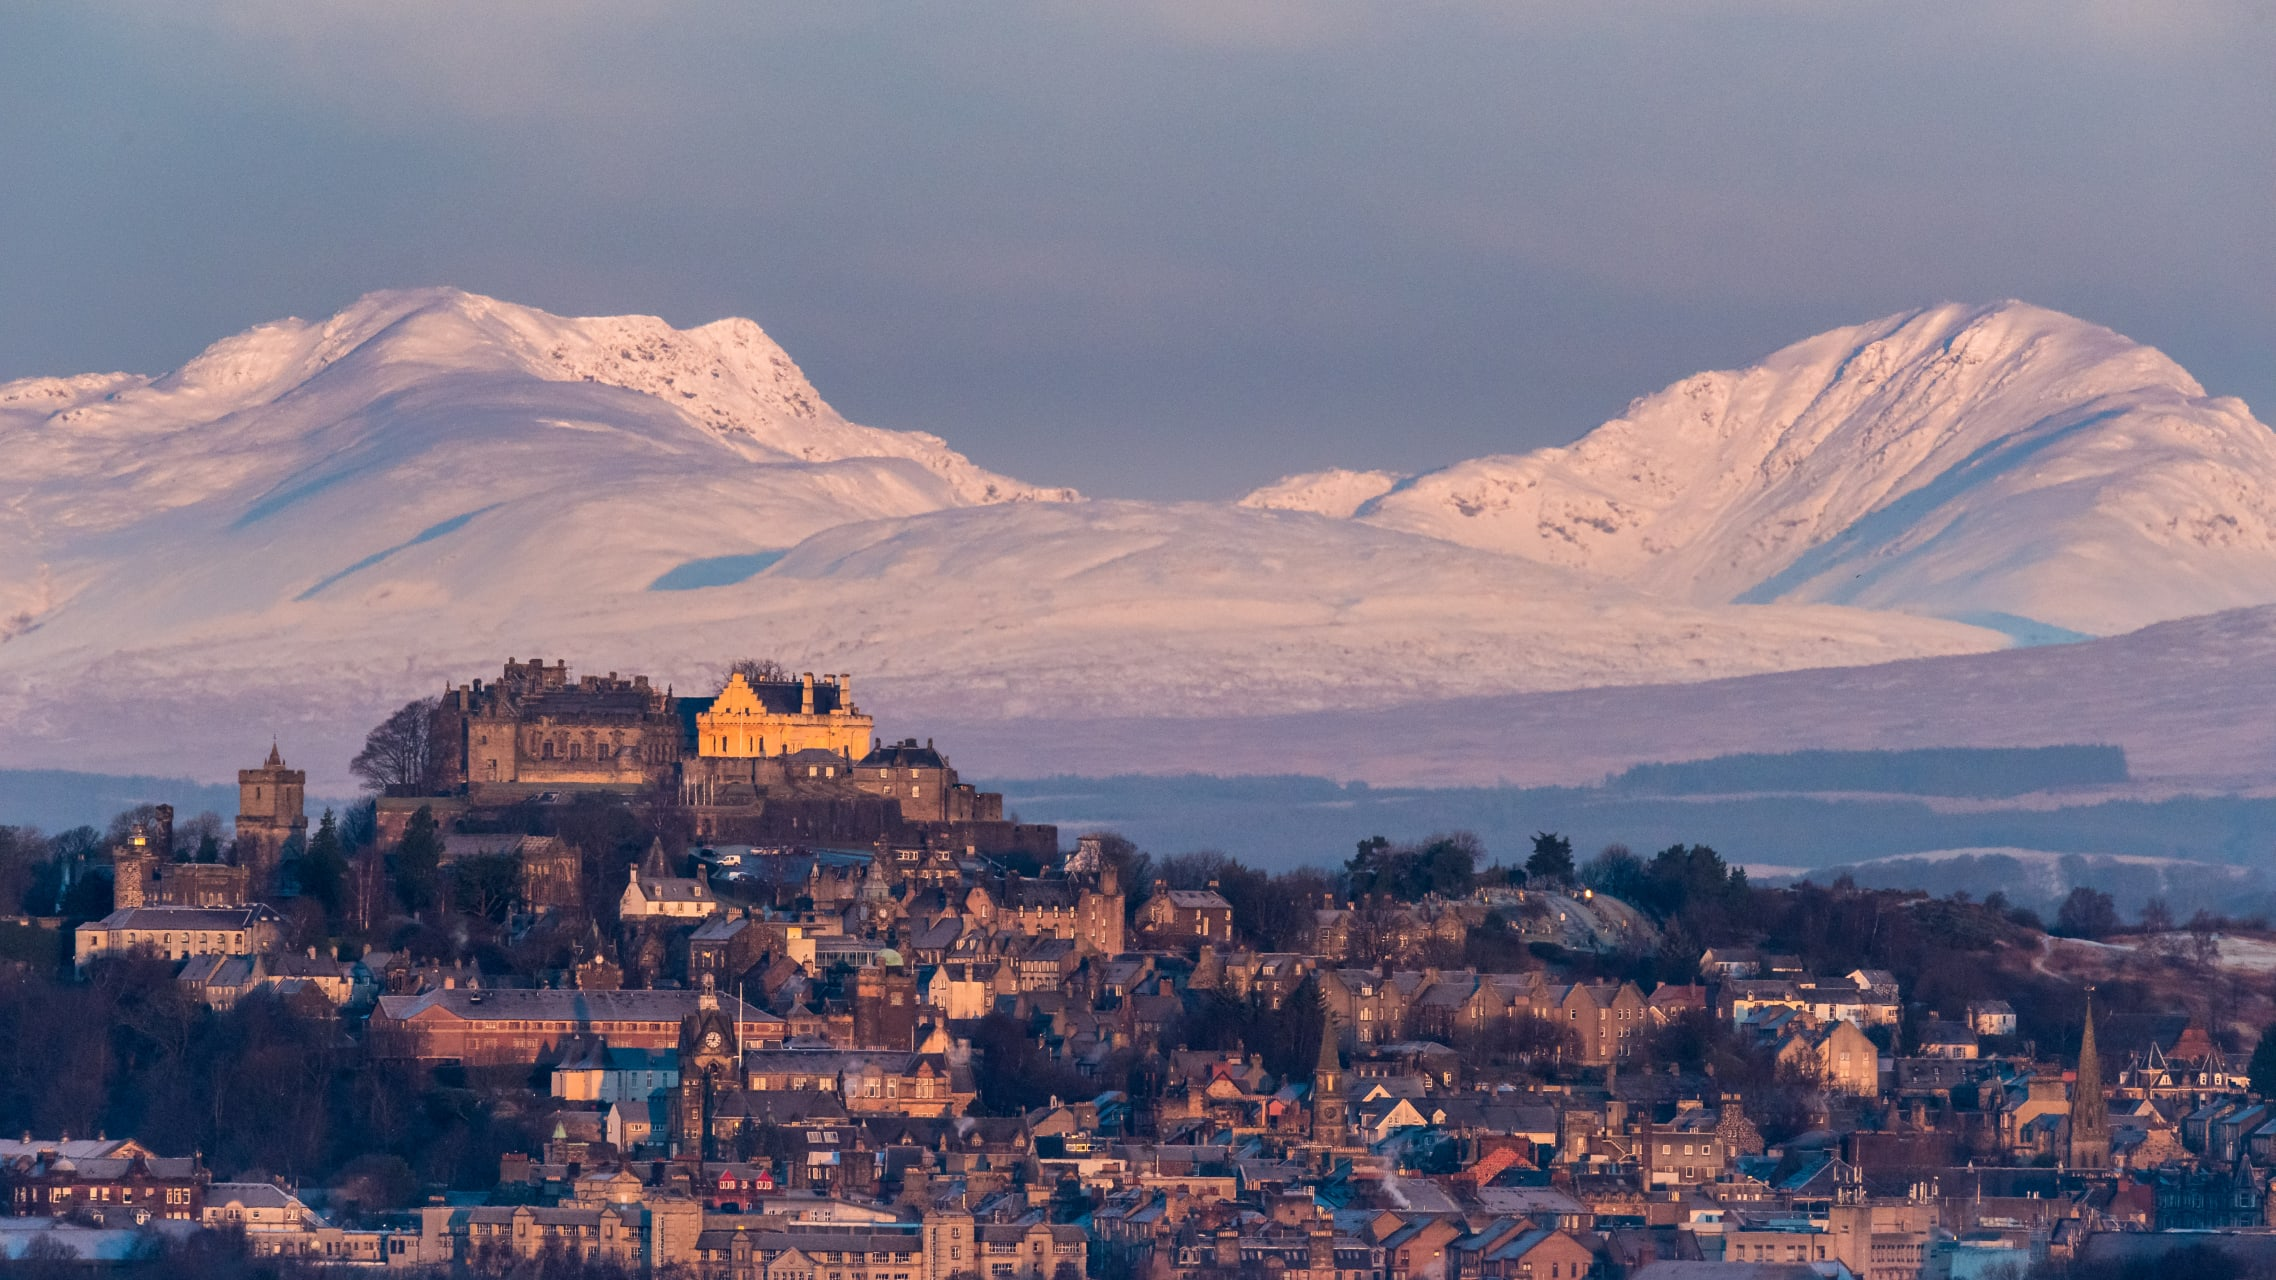 Central Scotland cover image